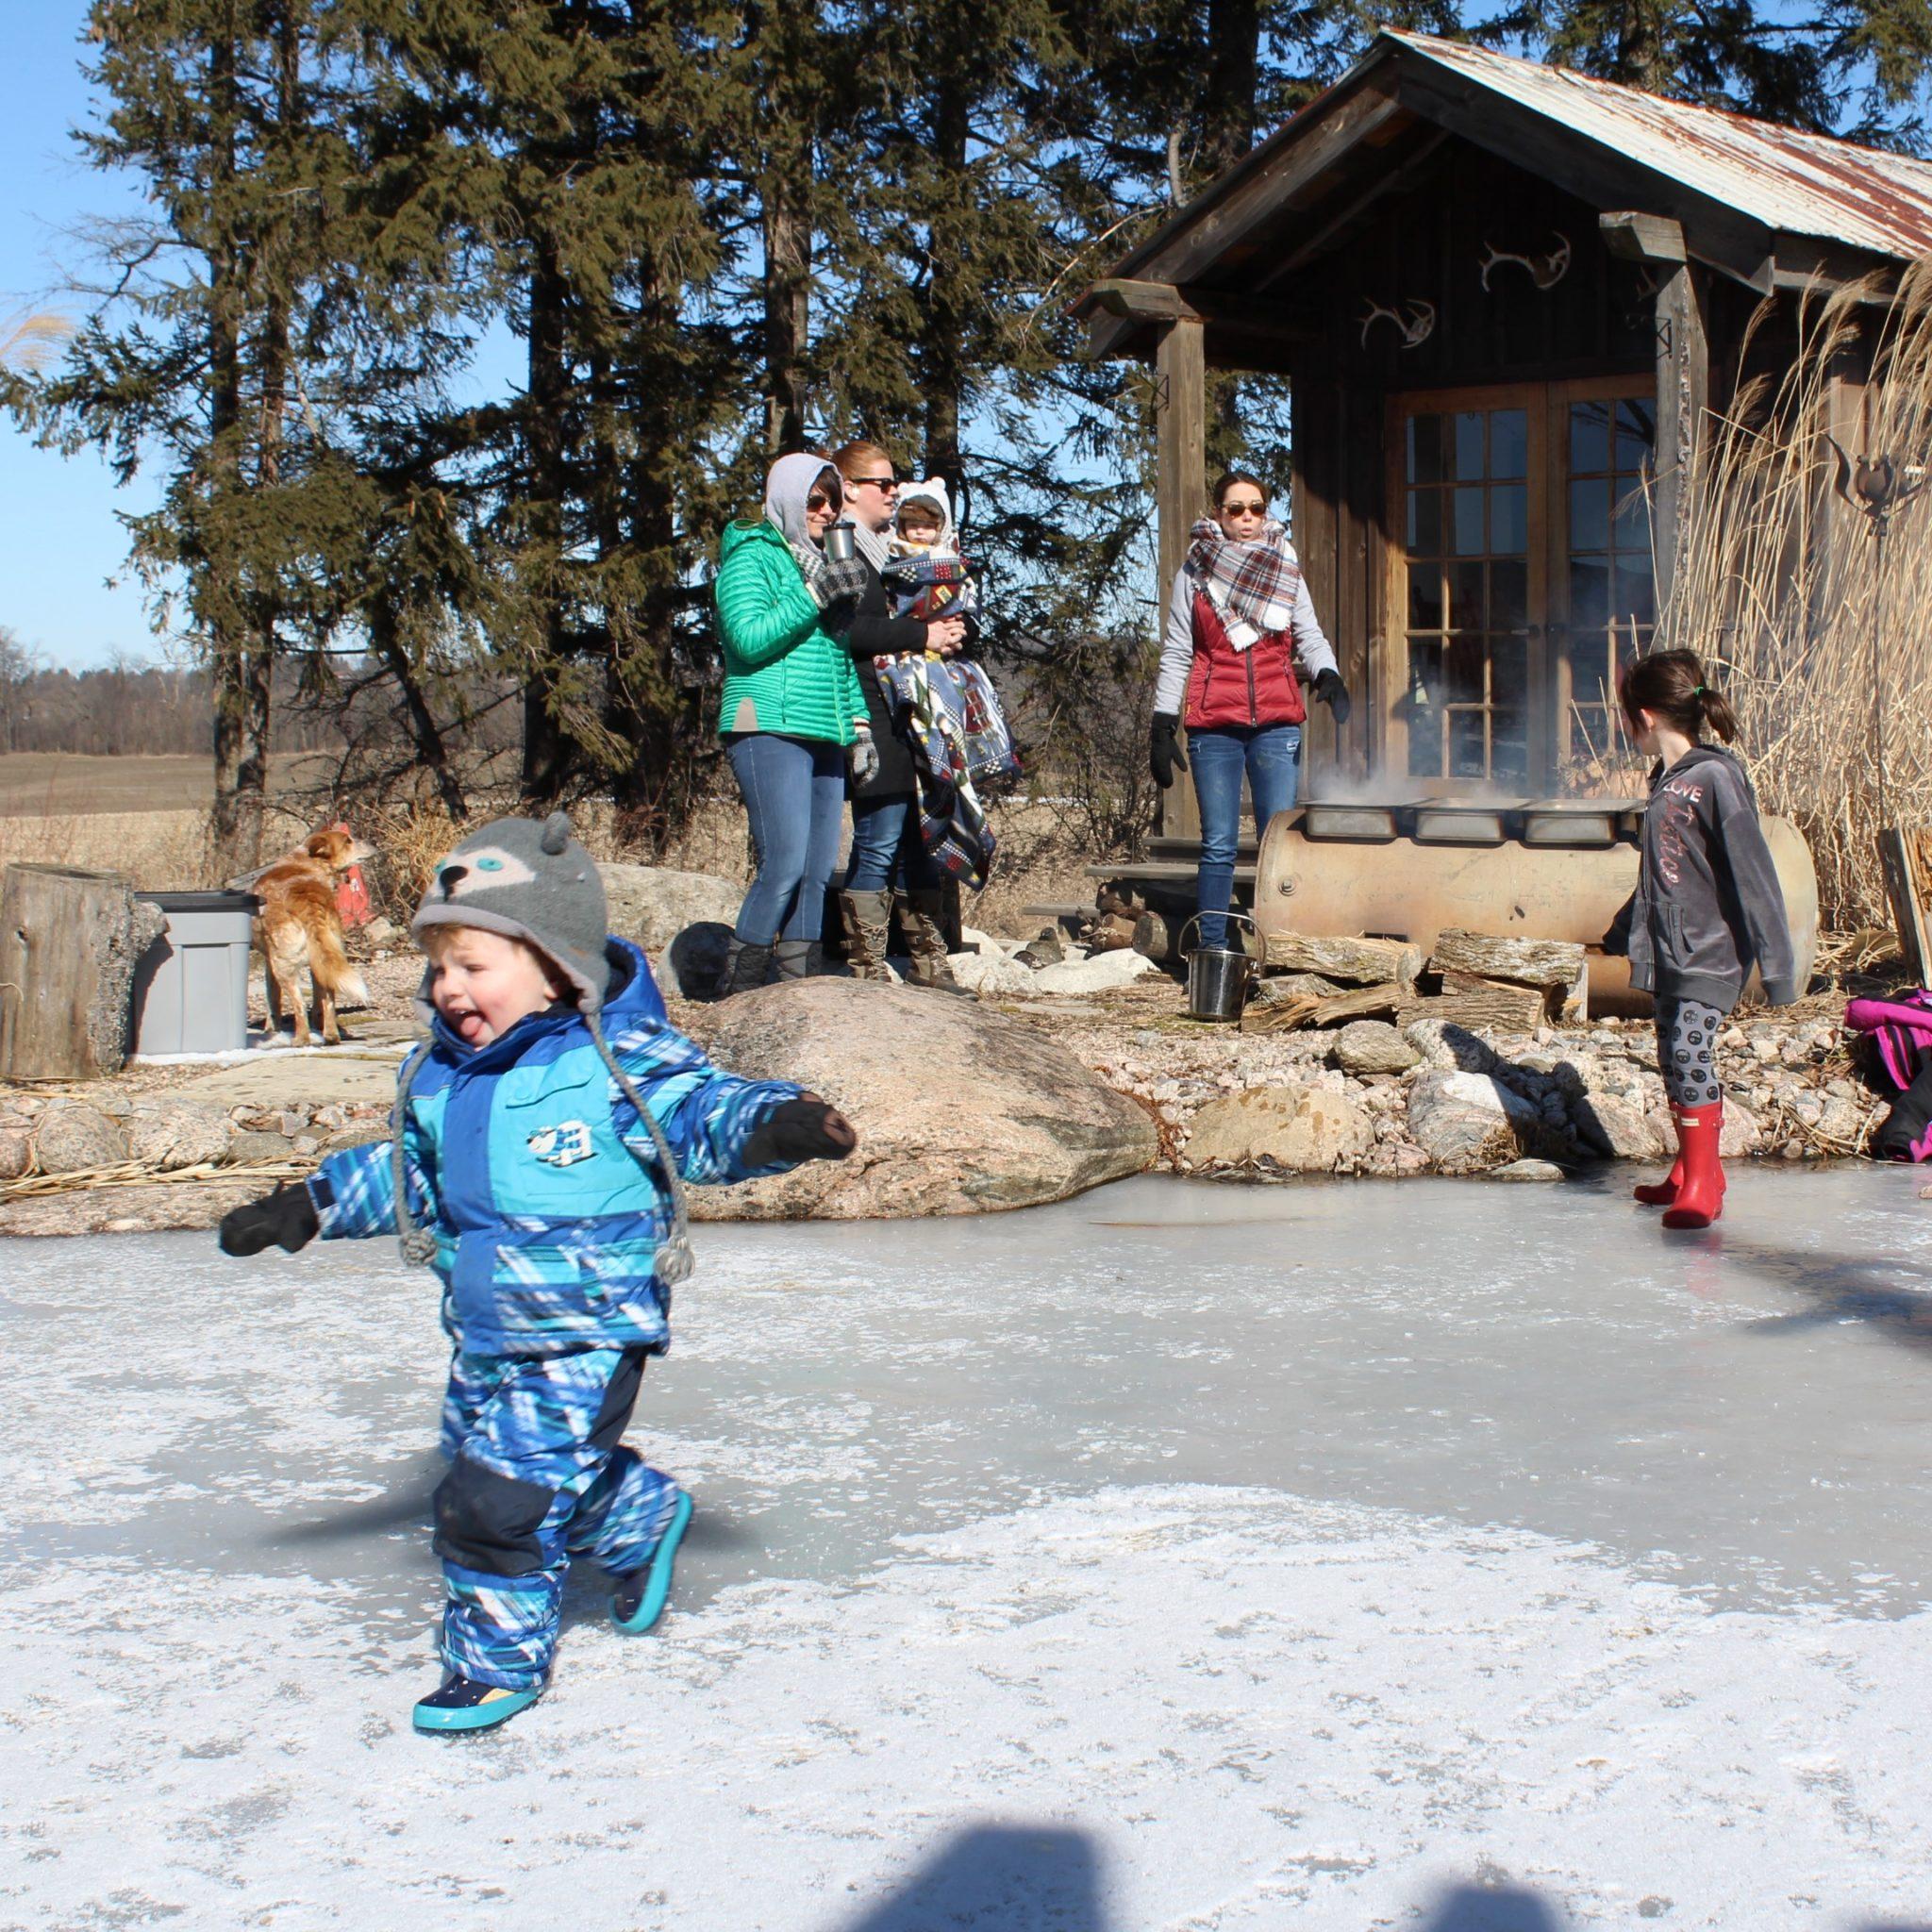 Natural swim pond skating